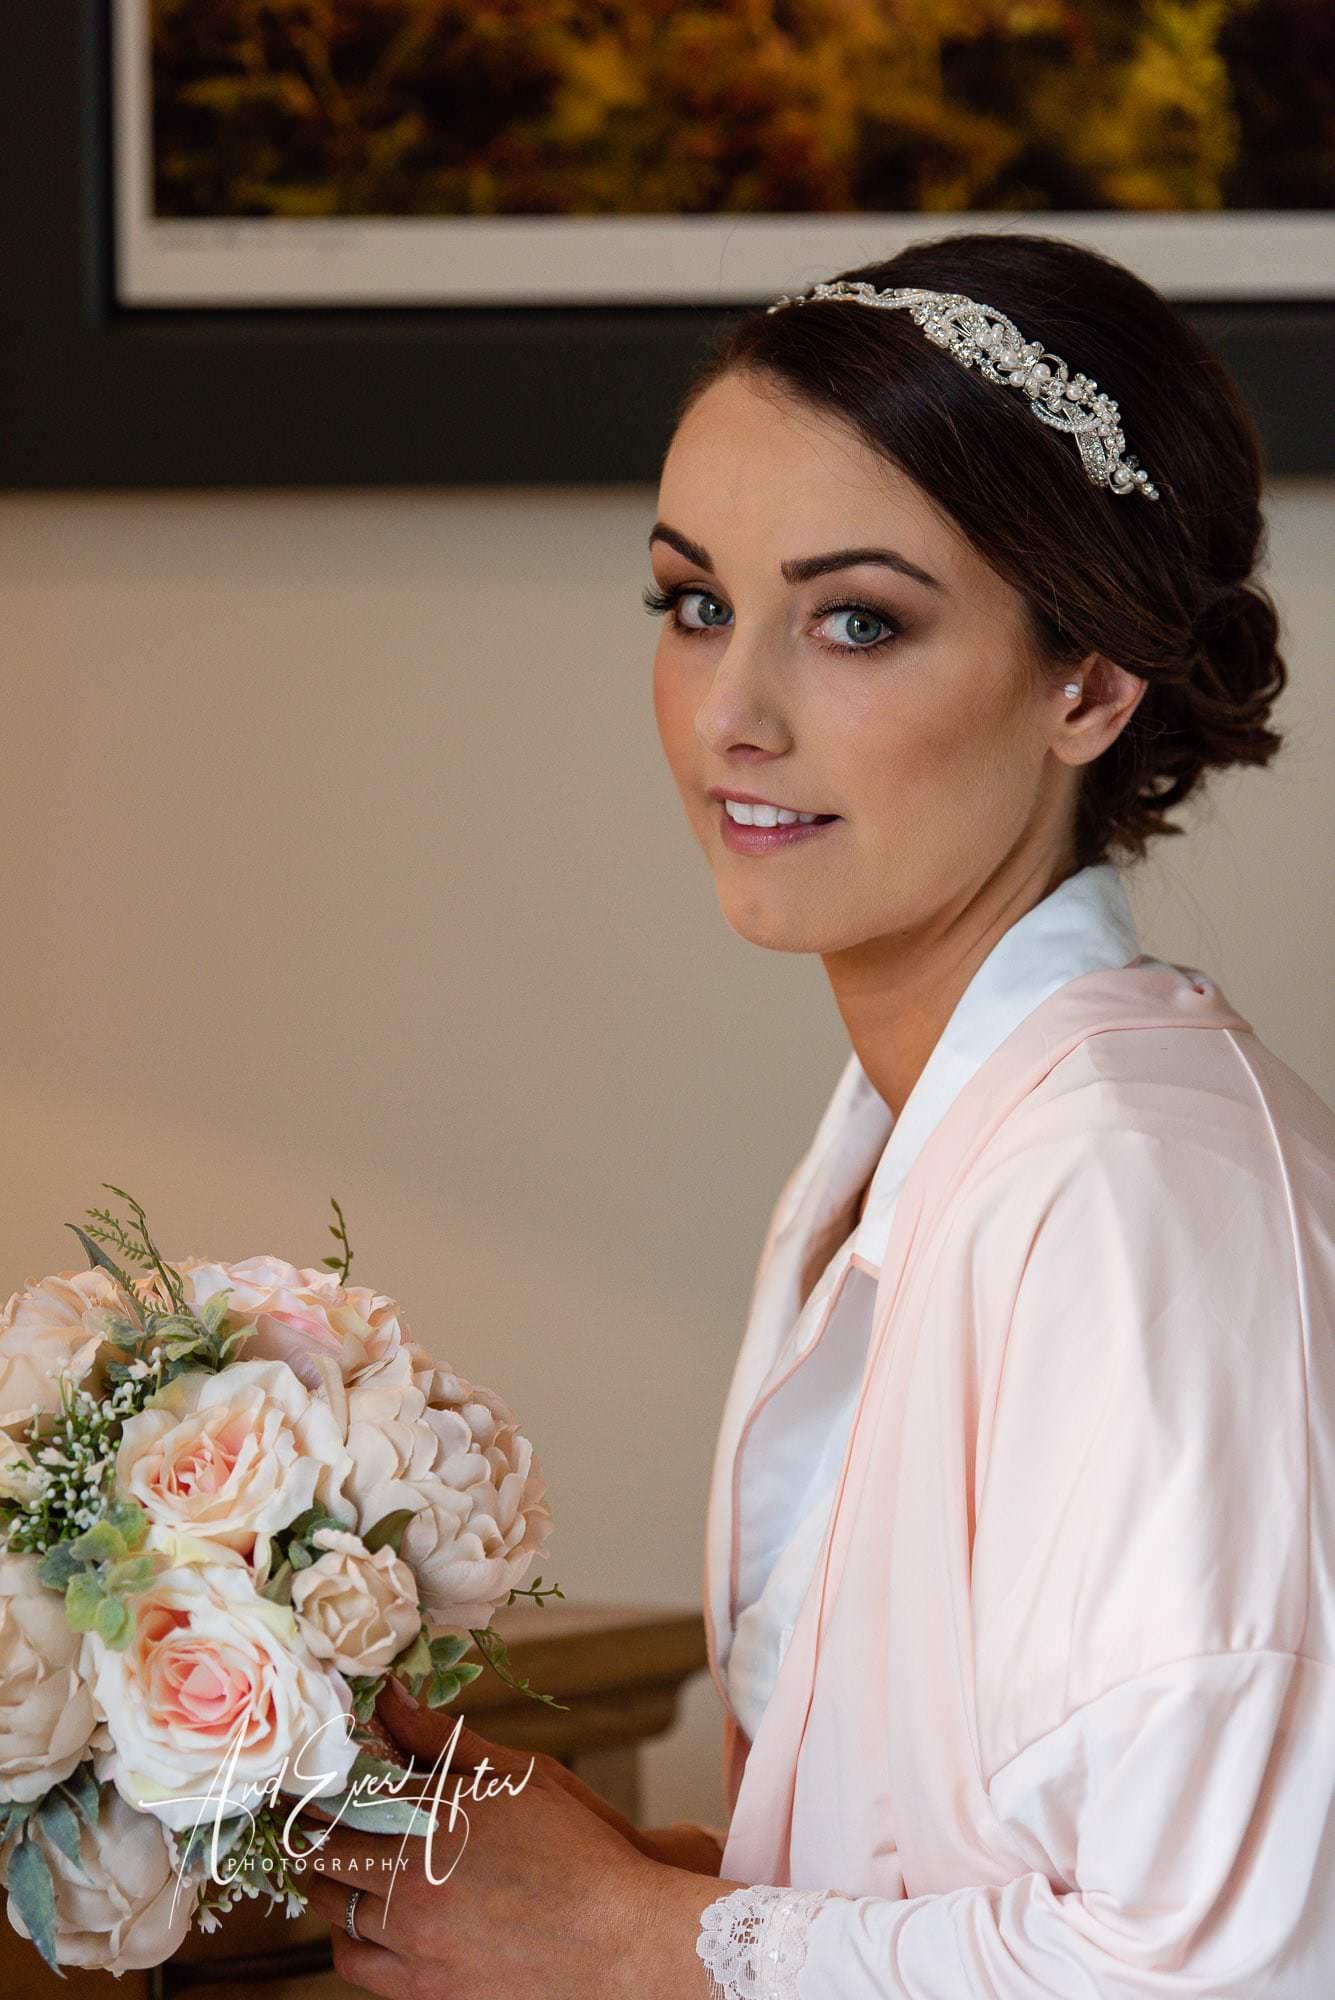 Bride, wedding day flowers